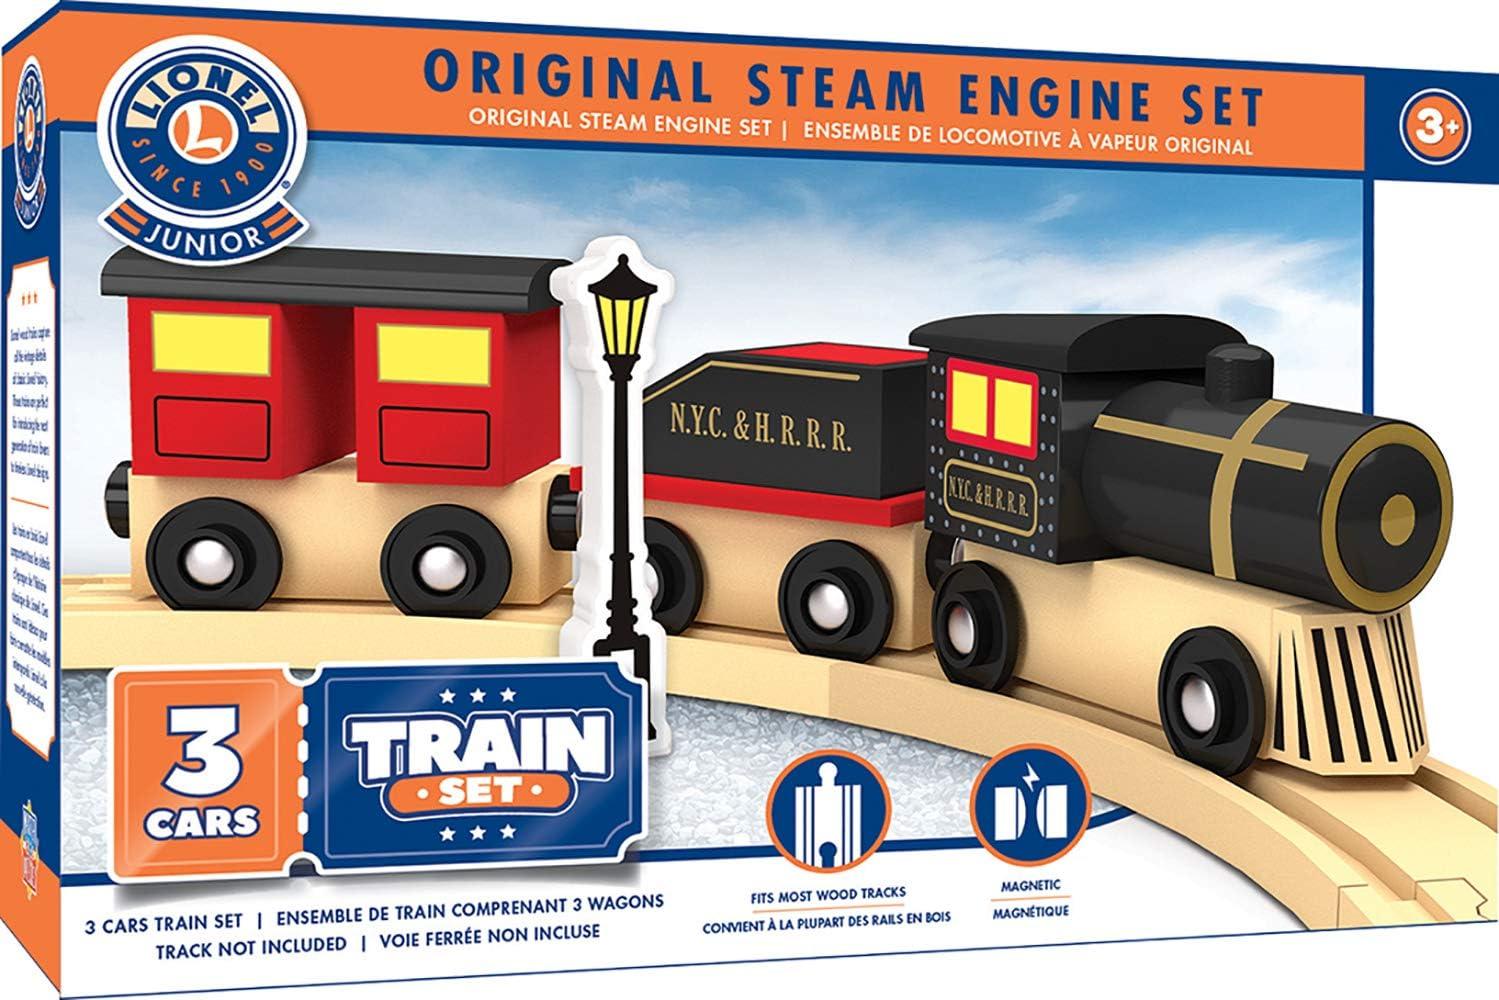 MasterPieces Lionel Original Steam Engine Real Wood Toy Train Set, Assorted